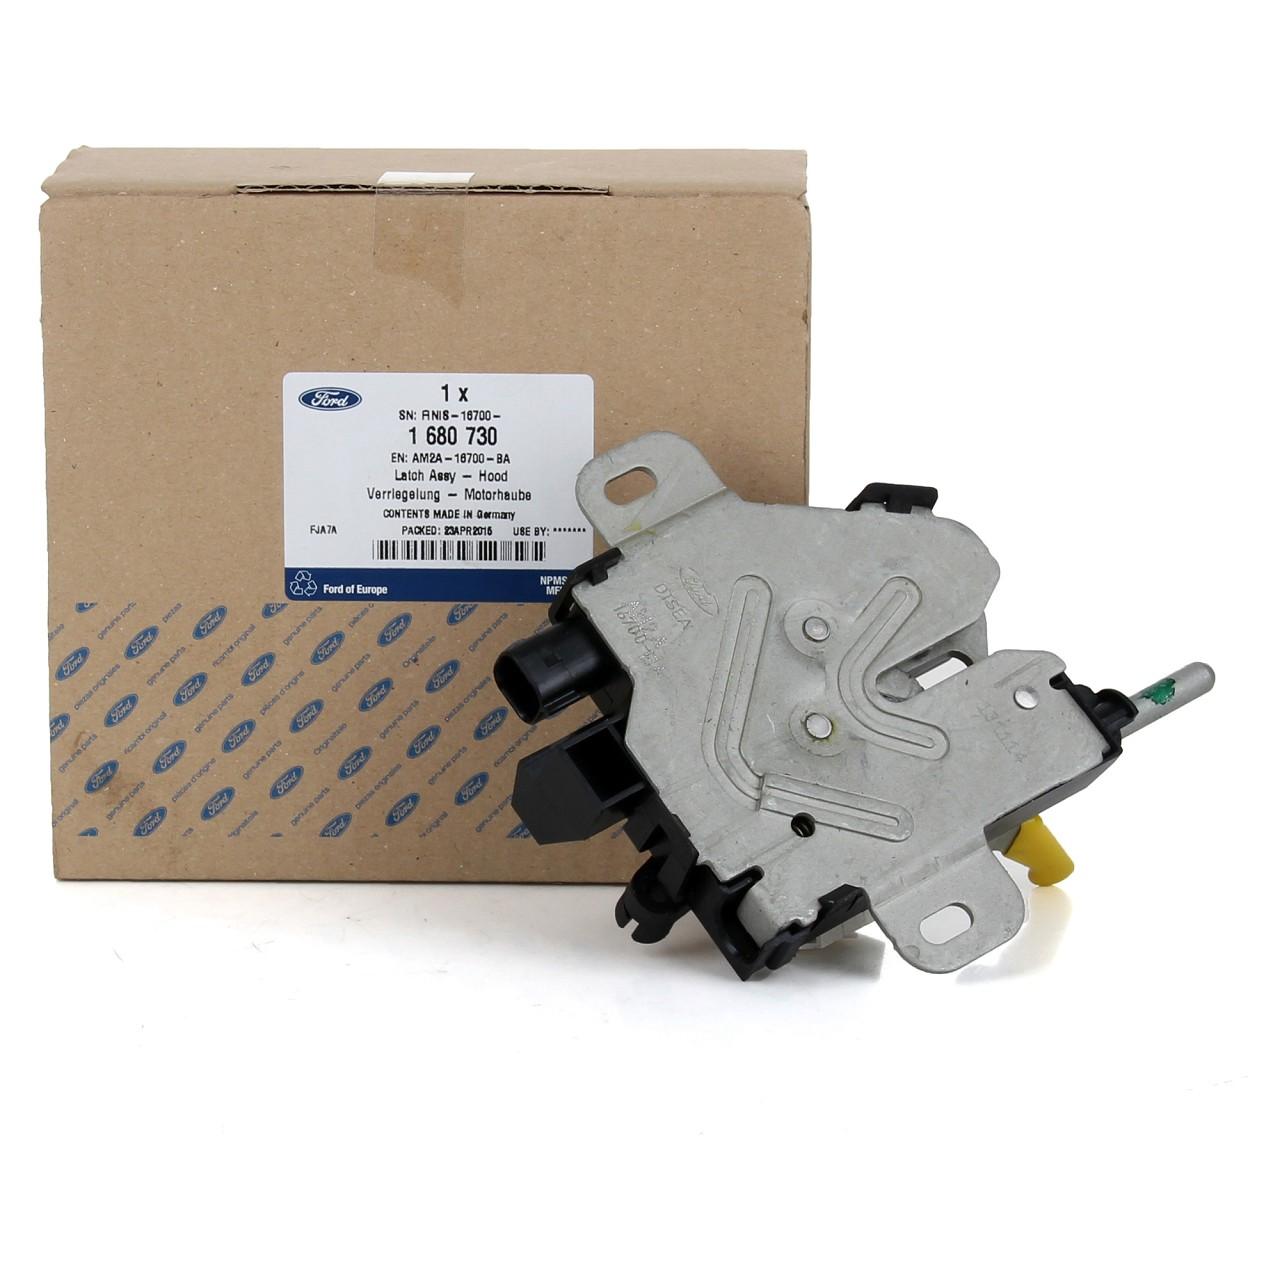 ORIGINAL Ford Motorhaubenschloss Verschluss Motorhaube GALAXY S-MAX WA6 1680730